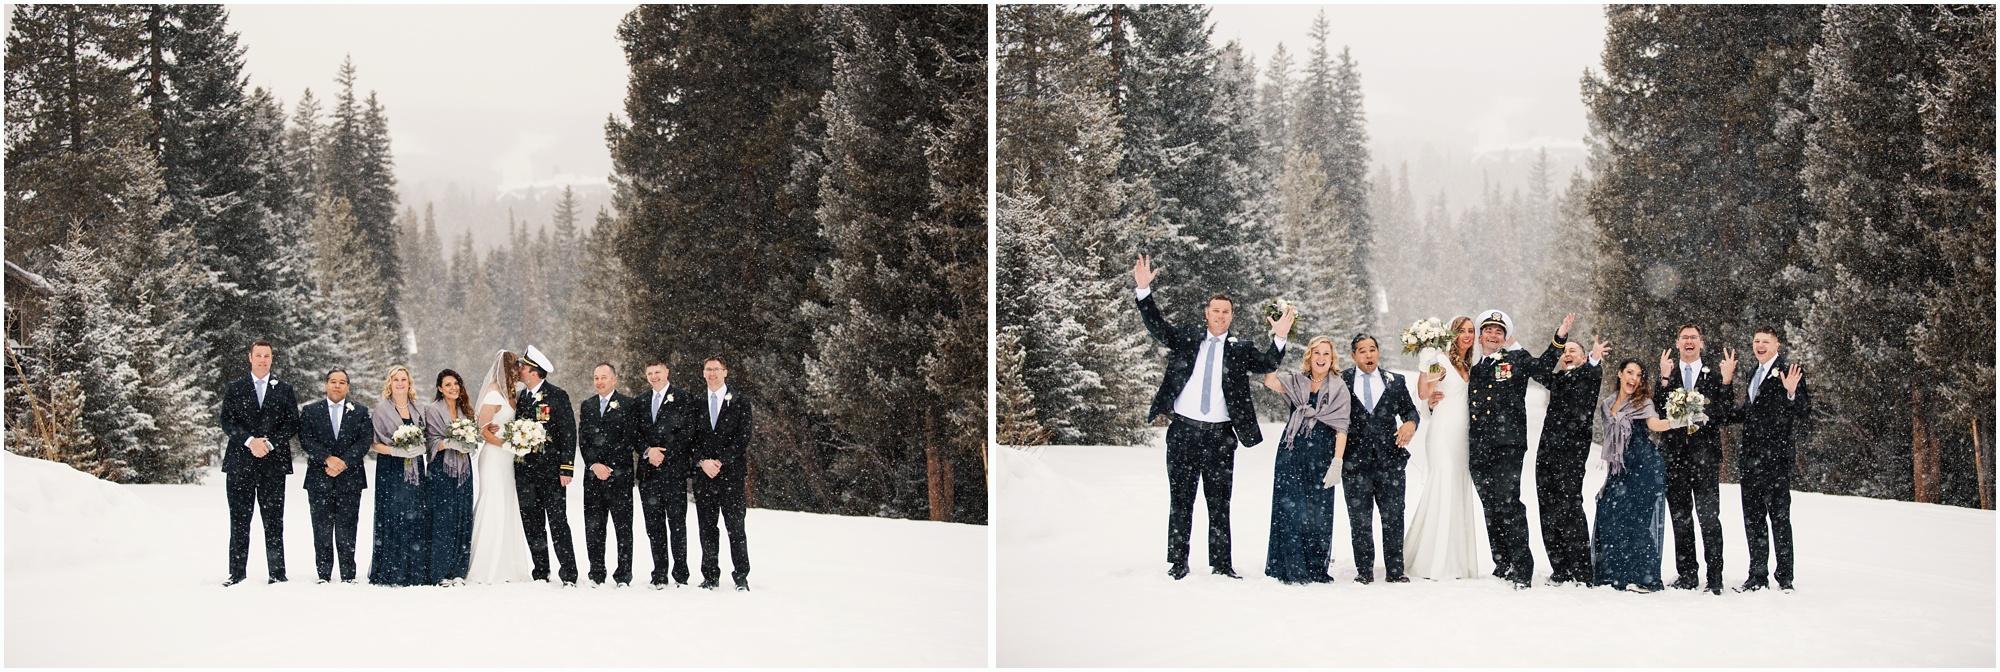 Breckenridge-Wedding-Photographer_0099.jpg